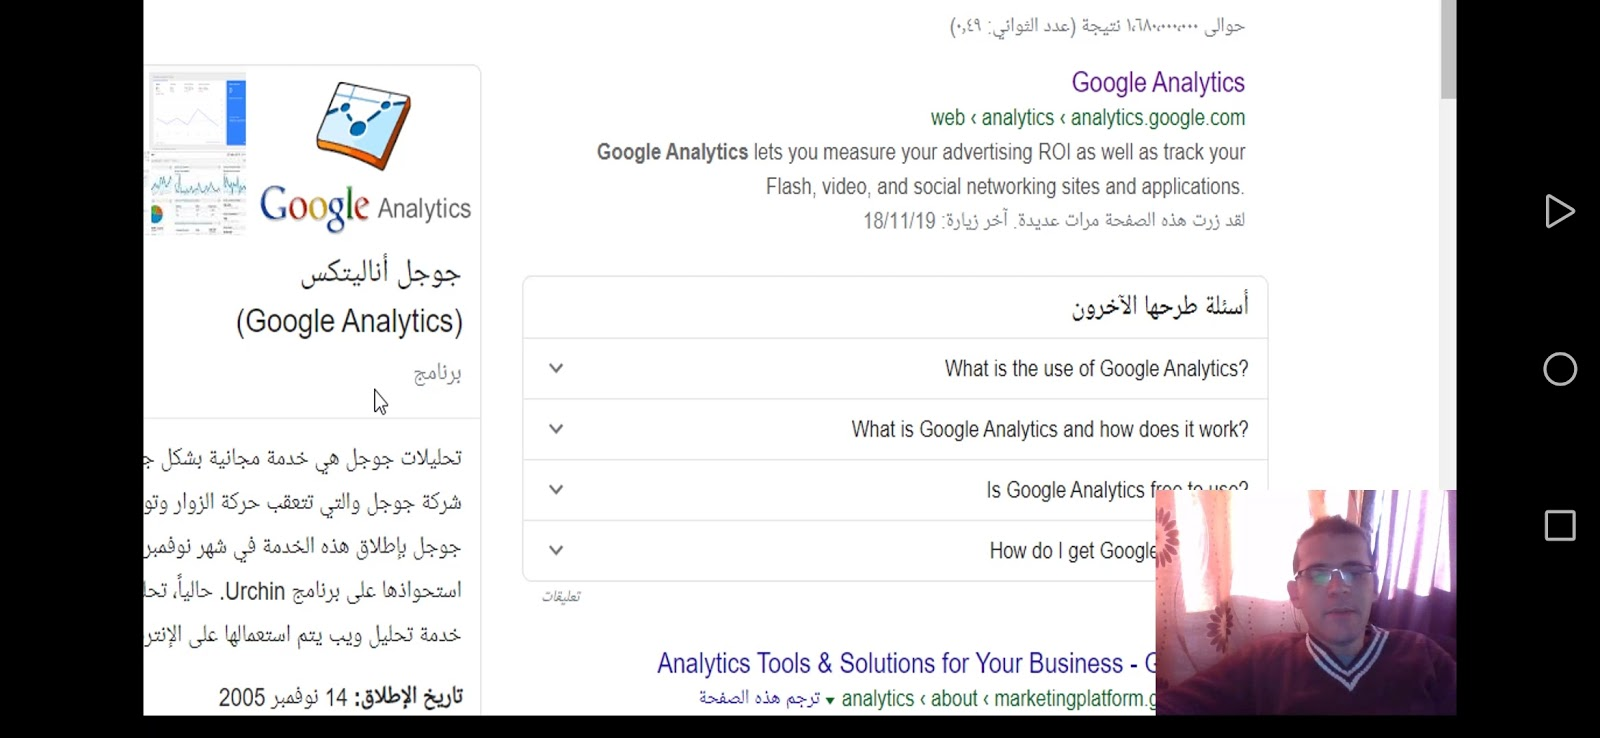 (جوجل اناليتكس Google Analytics)